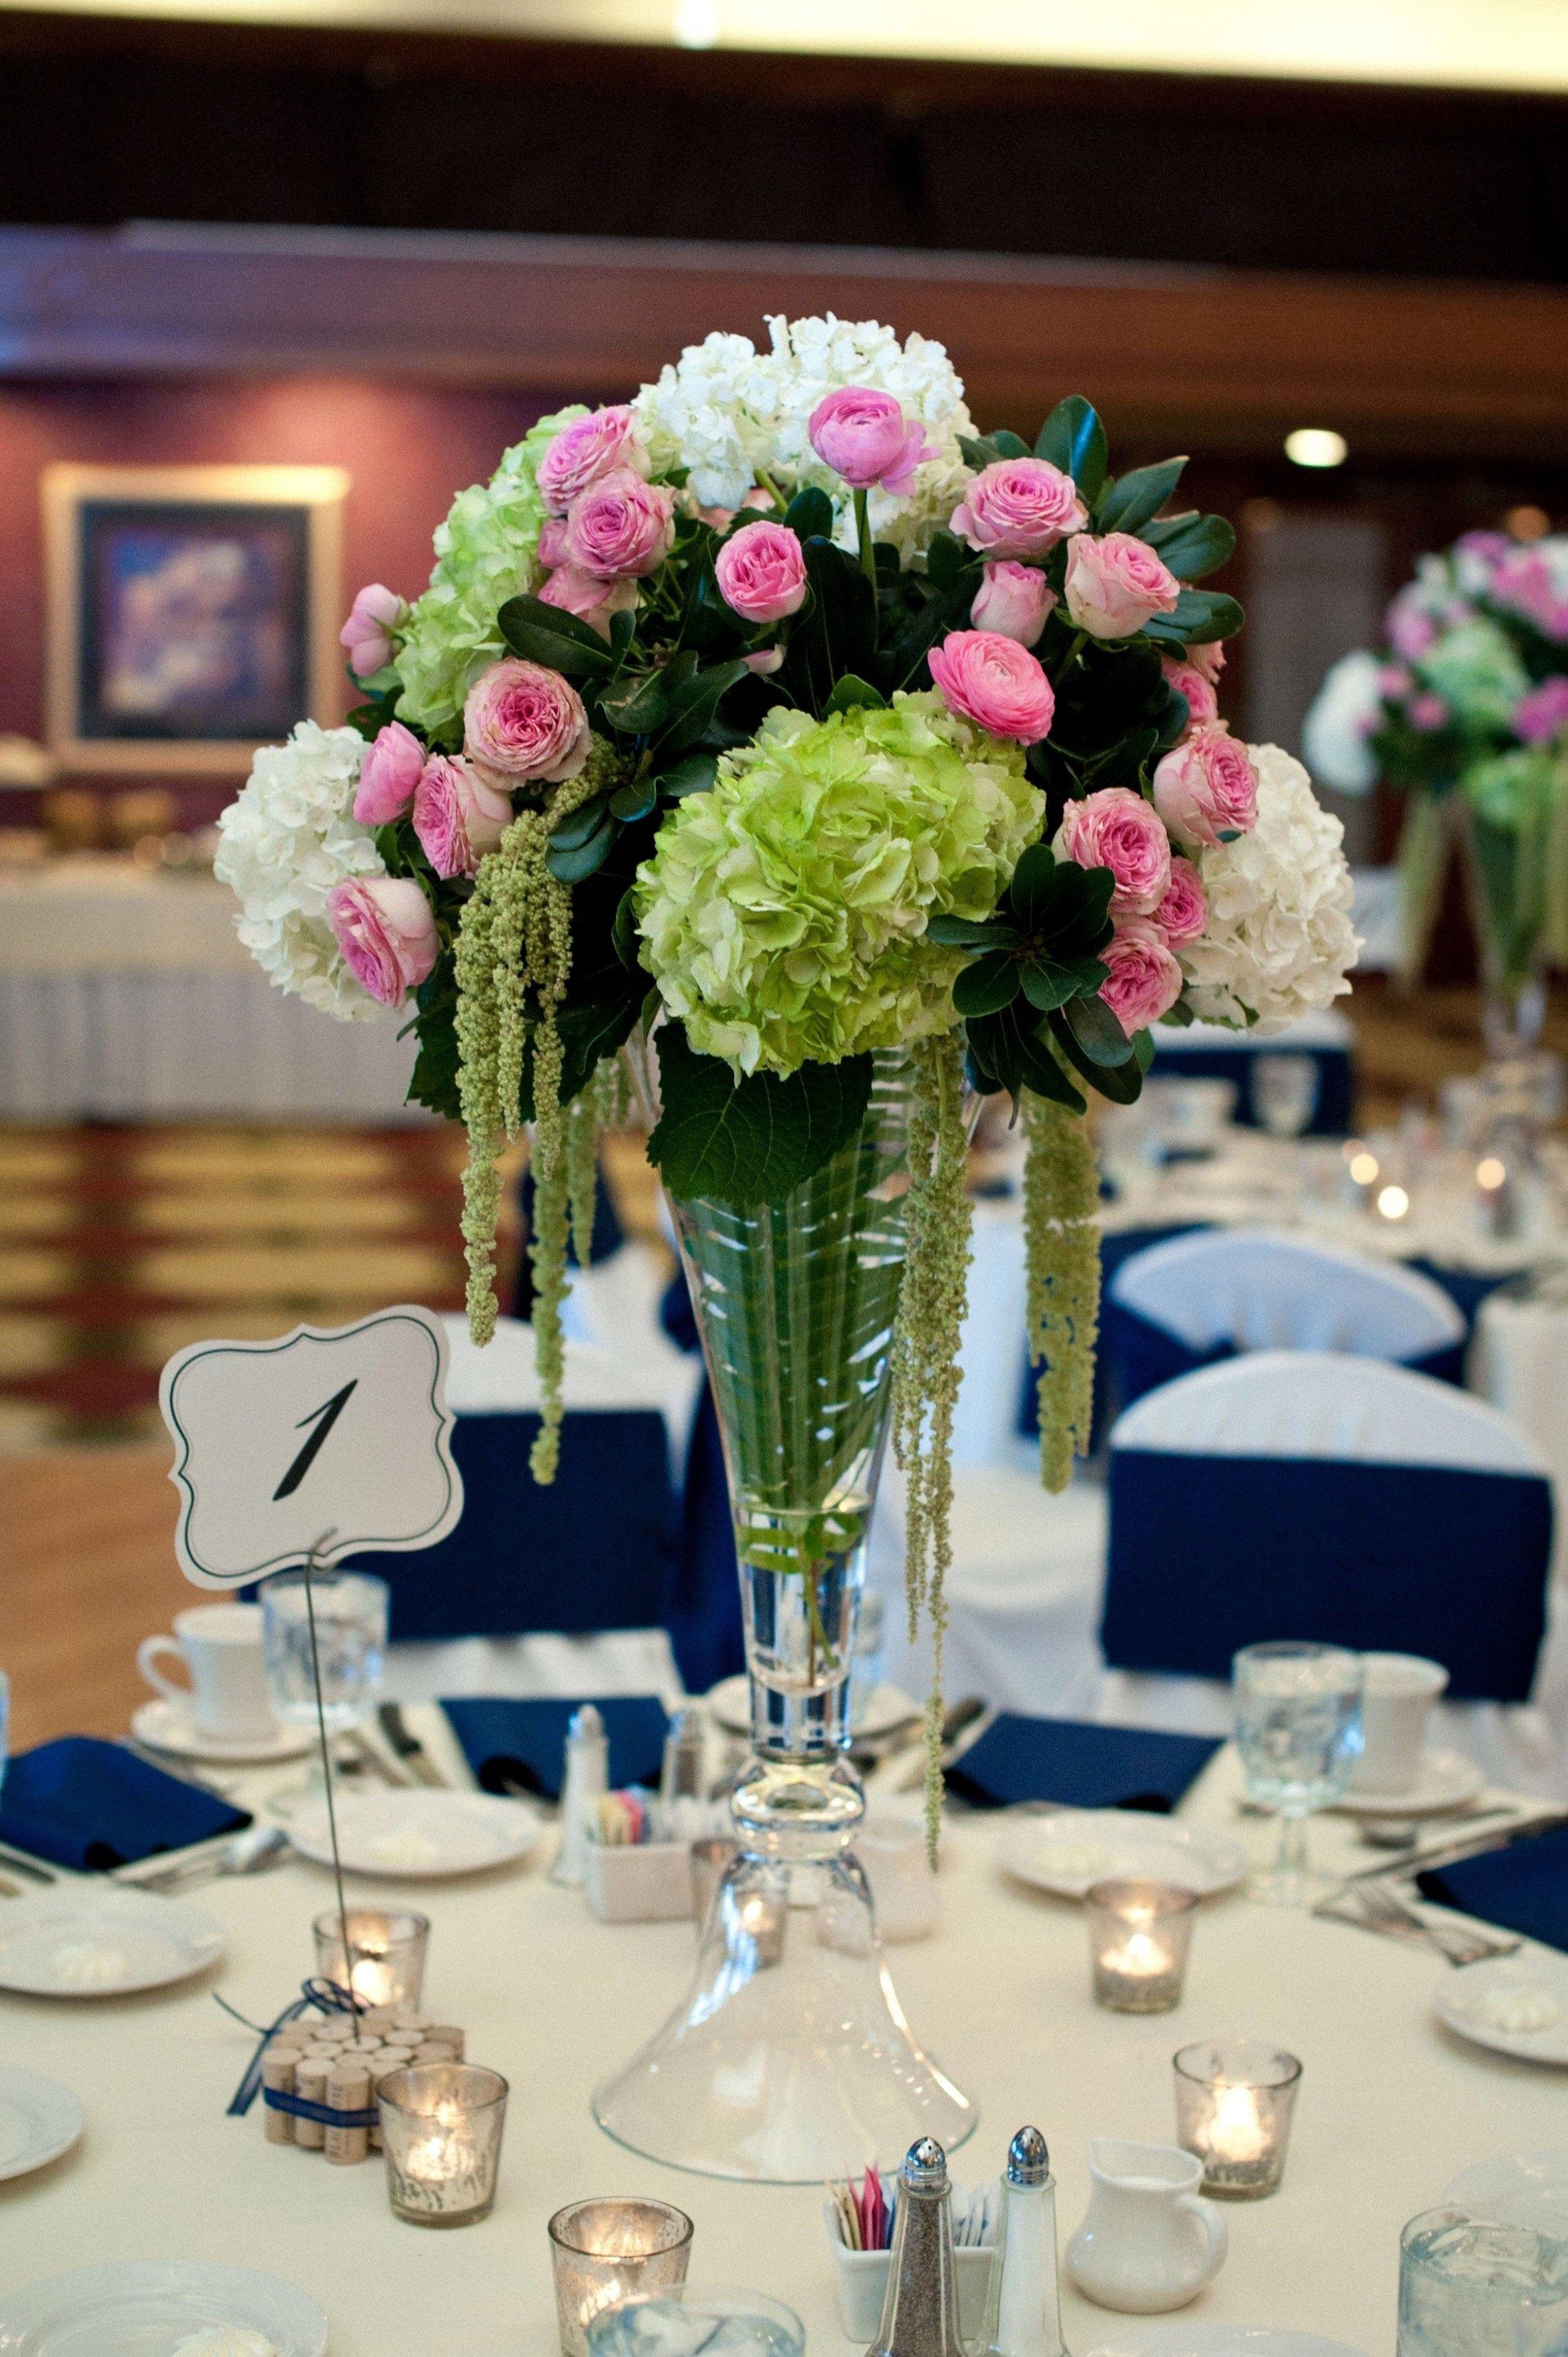 flower arrangements in vases images of tulip bulb vase beautiful mirrored square vase 3h vases mirror table regarding tulip bulb vase beautiful mirrored square vase 3h vases mirror table decorationi 0d weddings